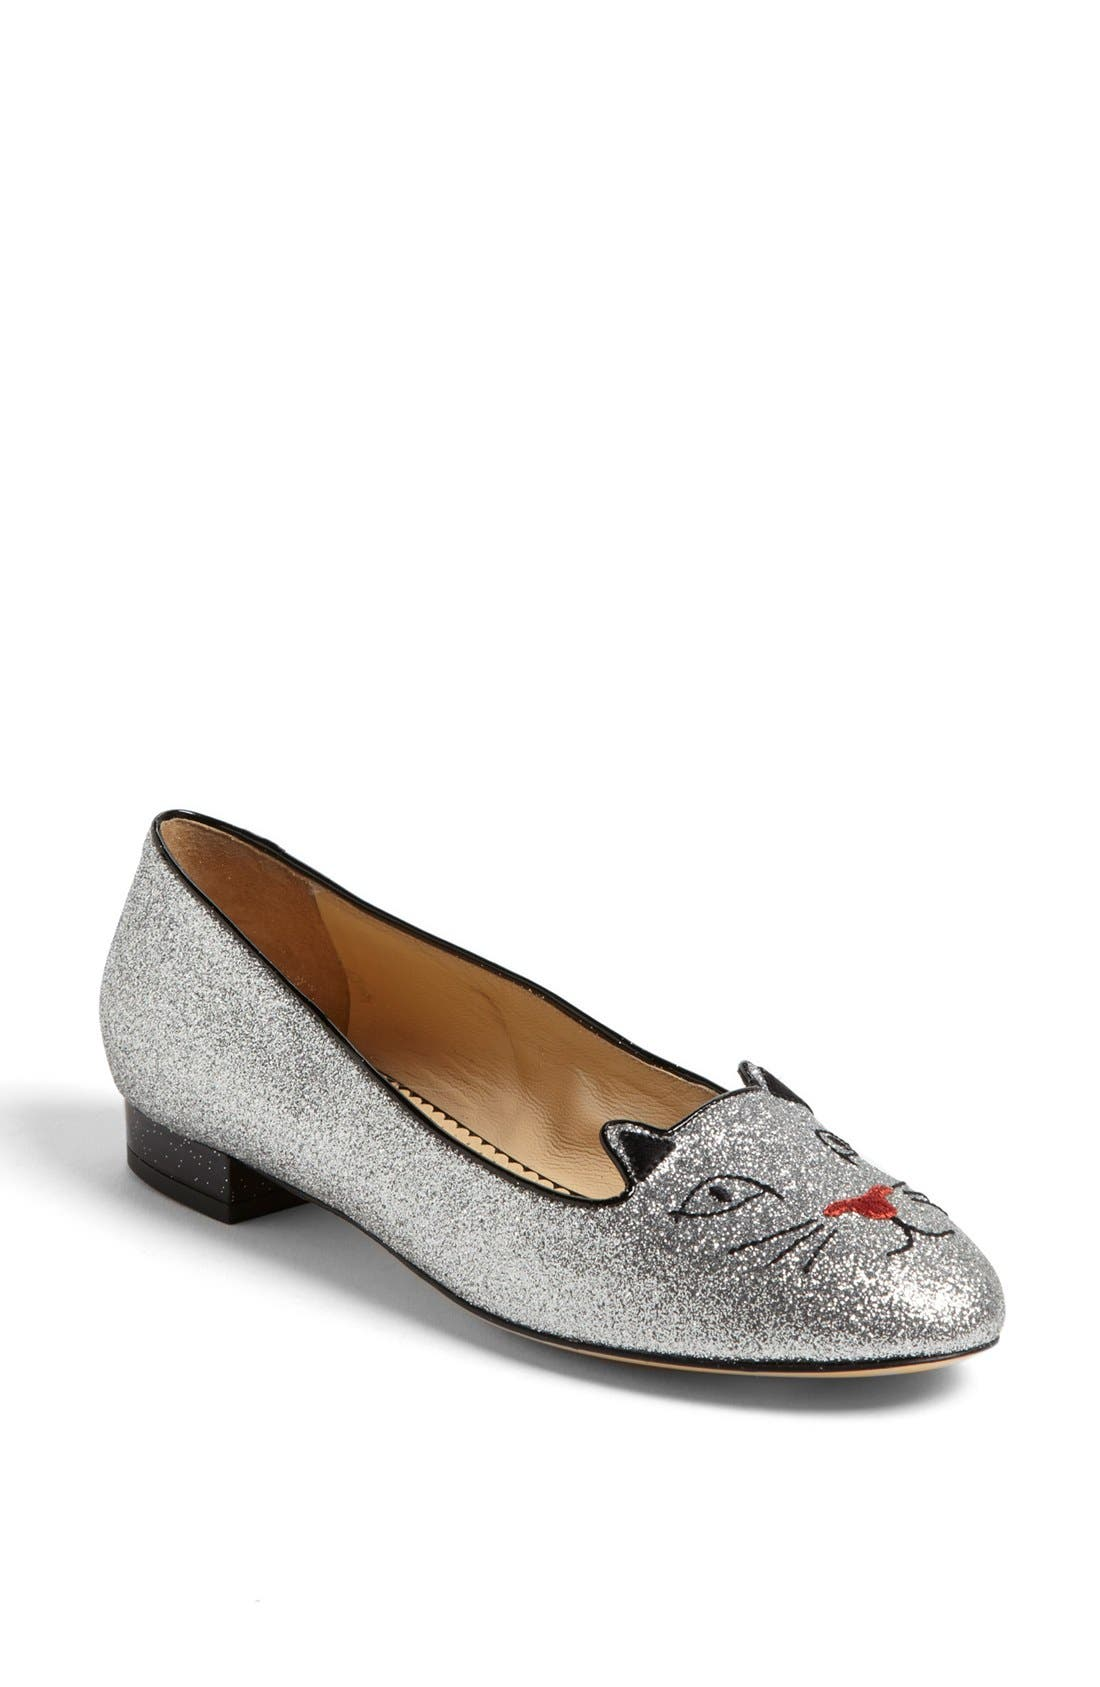 Alternate Image 1 Selected - Charlotte Olympia 'Glitter Kitty' Flat